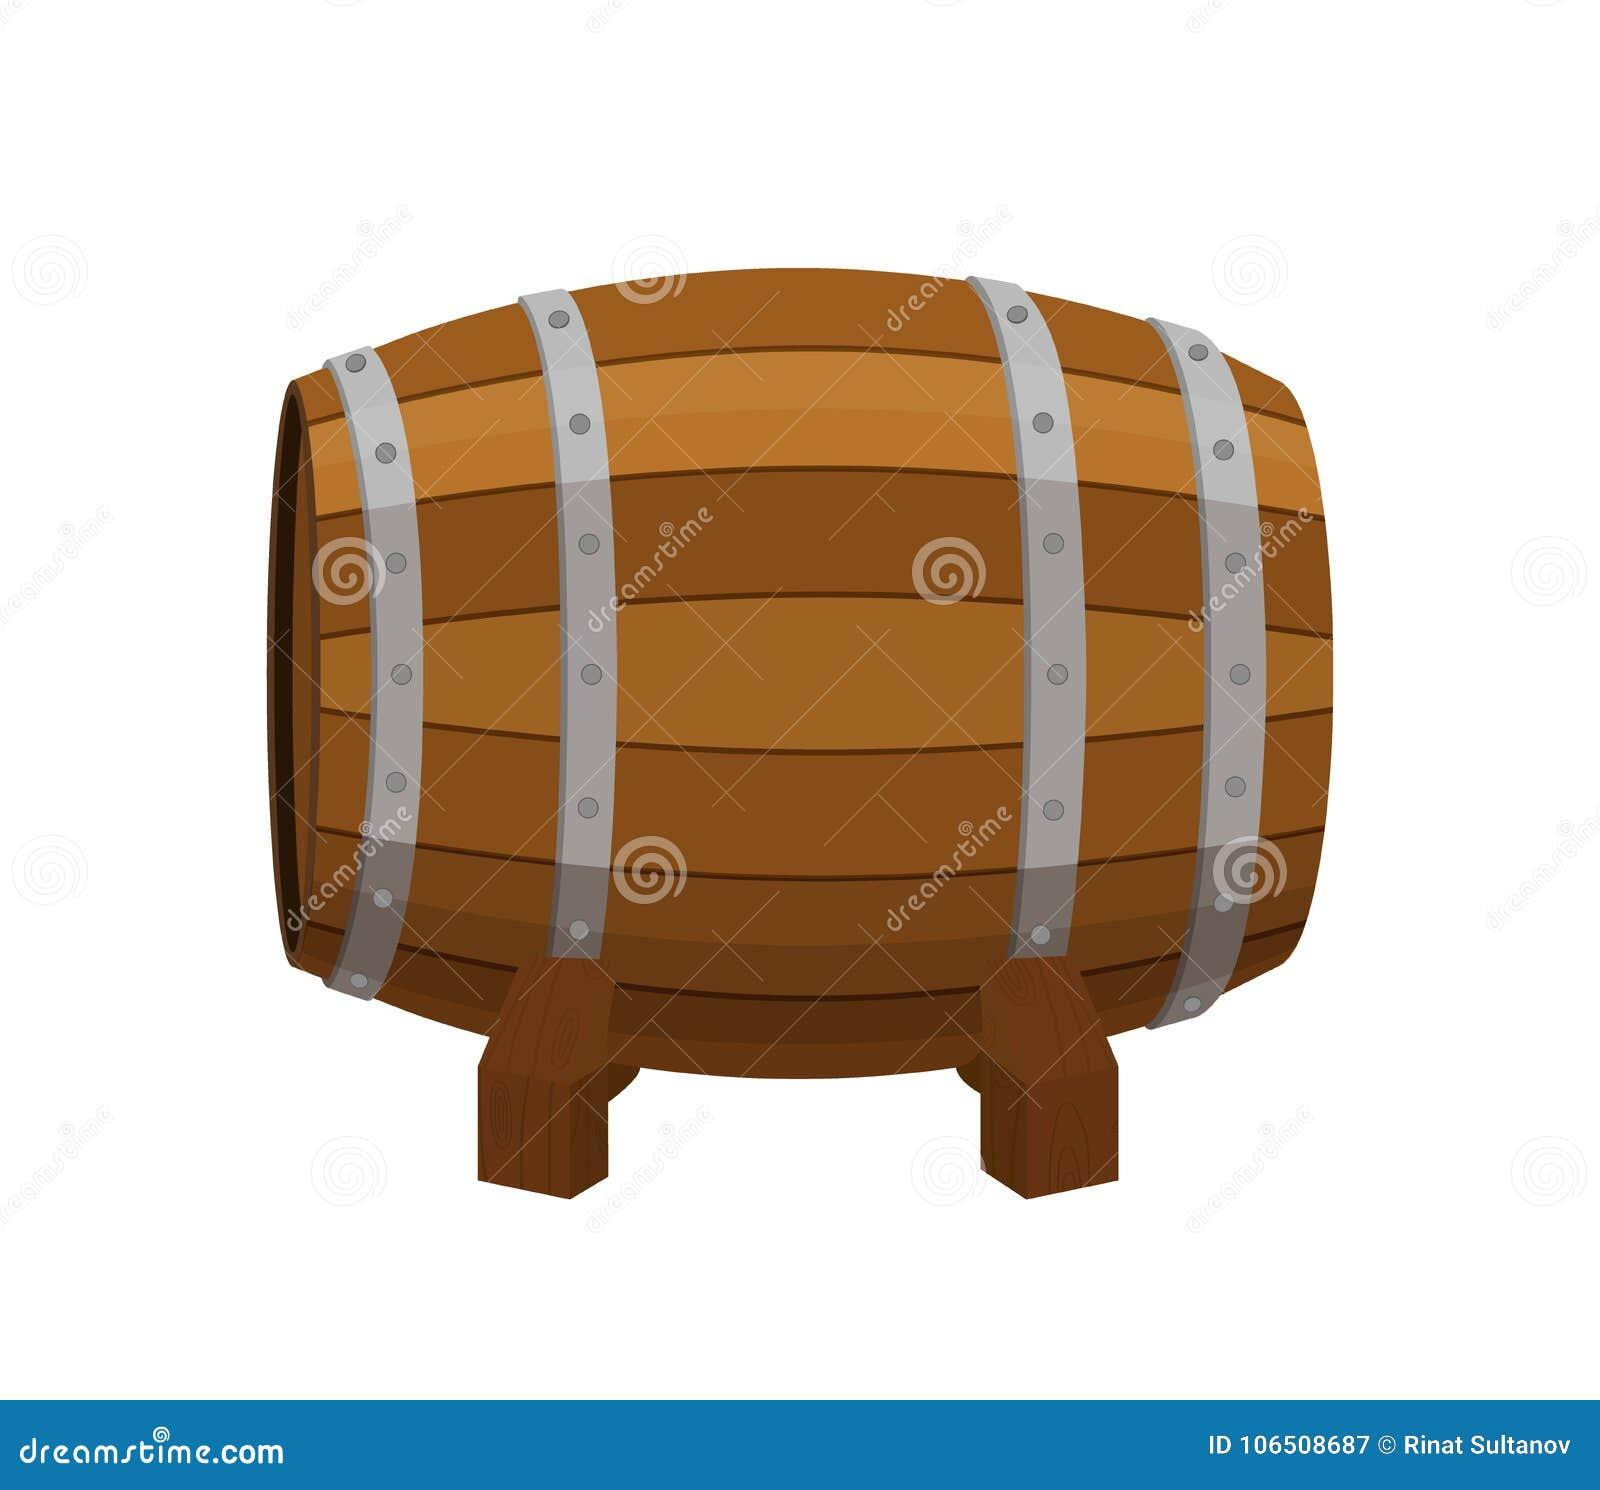 Tambor do álcool, recipiente de bebida, barril de madeira Estilo liso dos desenhos animados Vetor